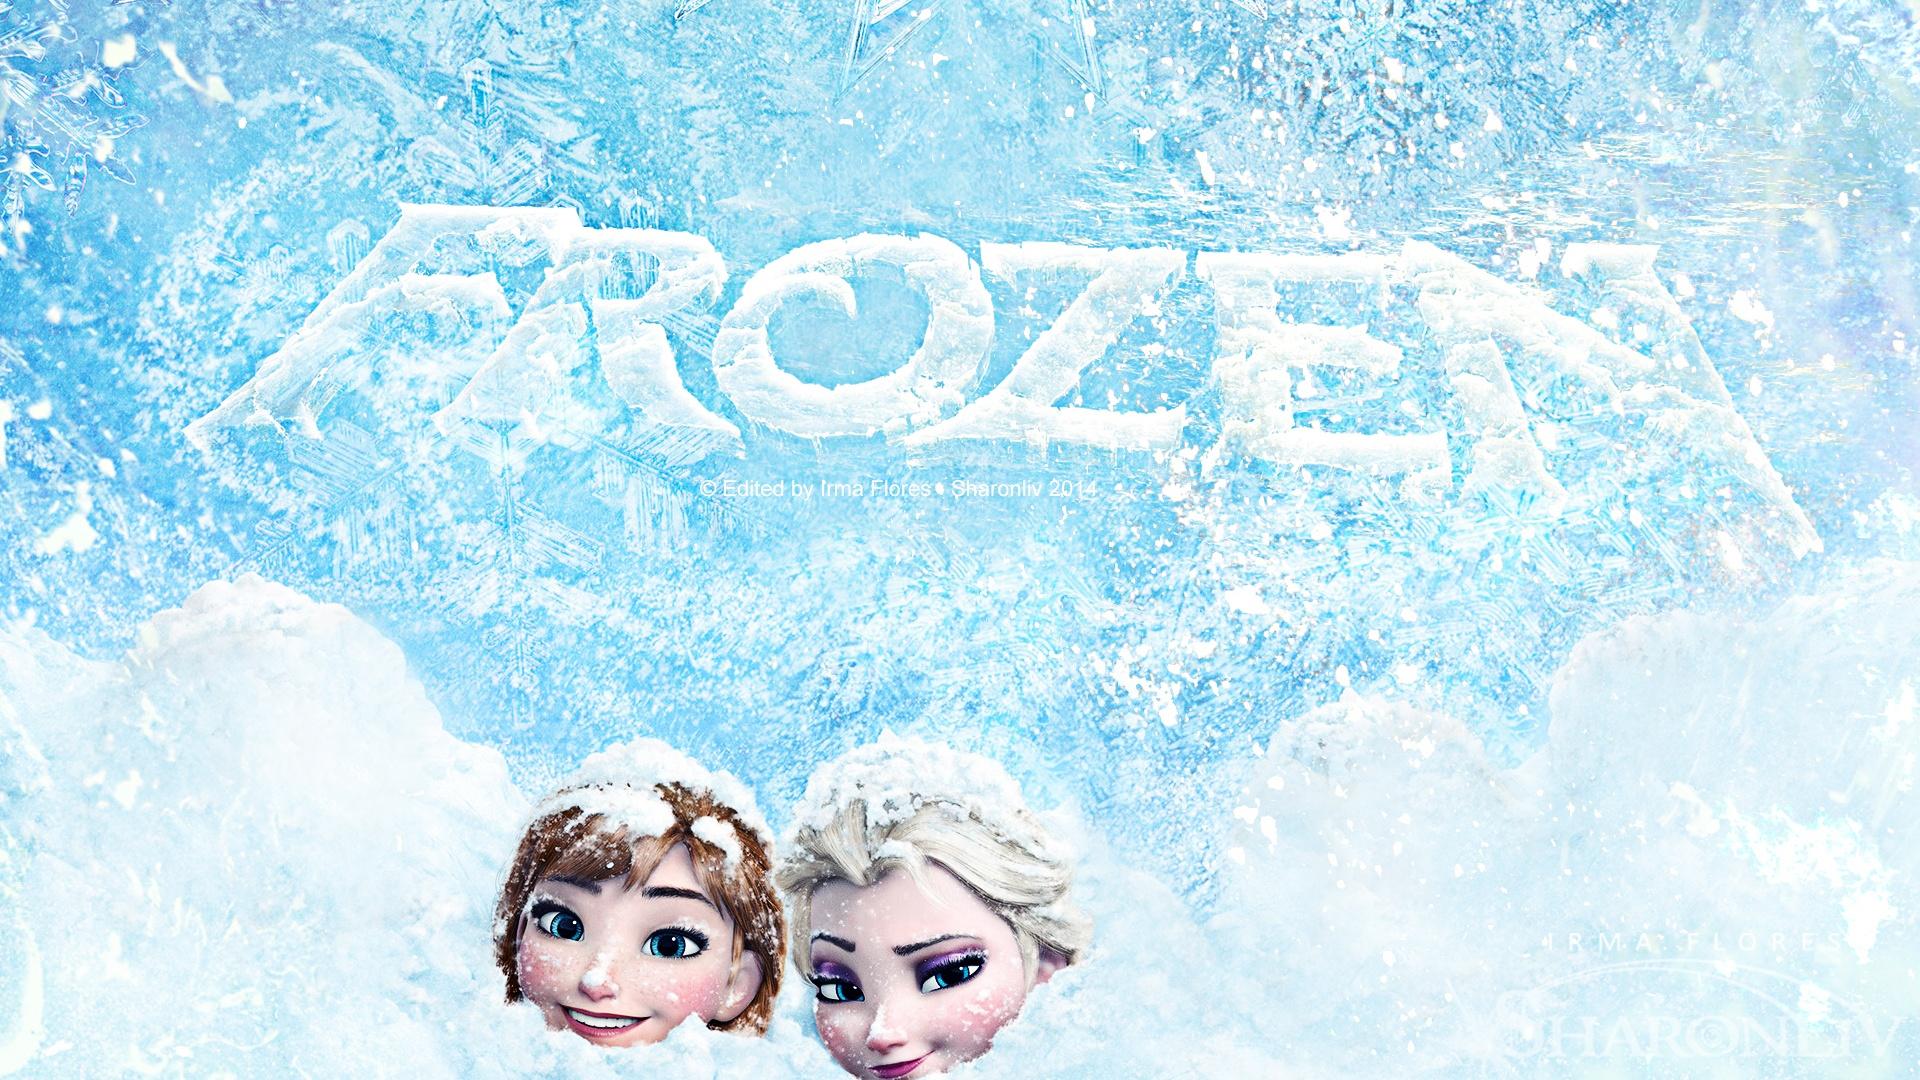 hinh nen frozen elsa 10